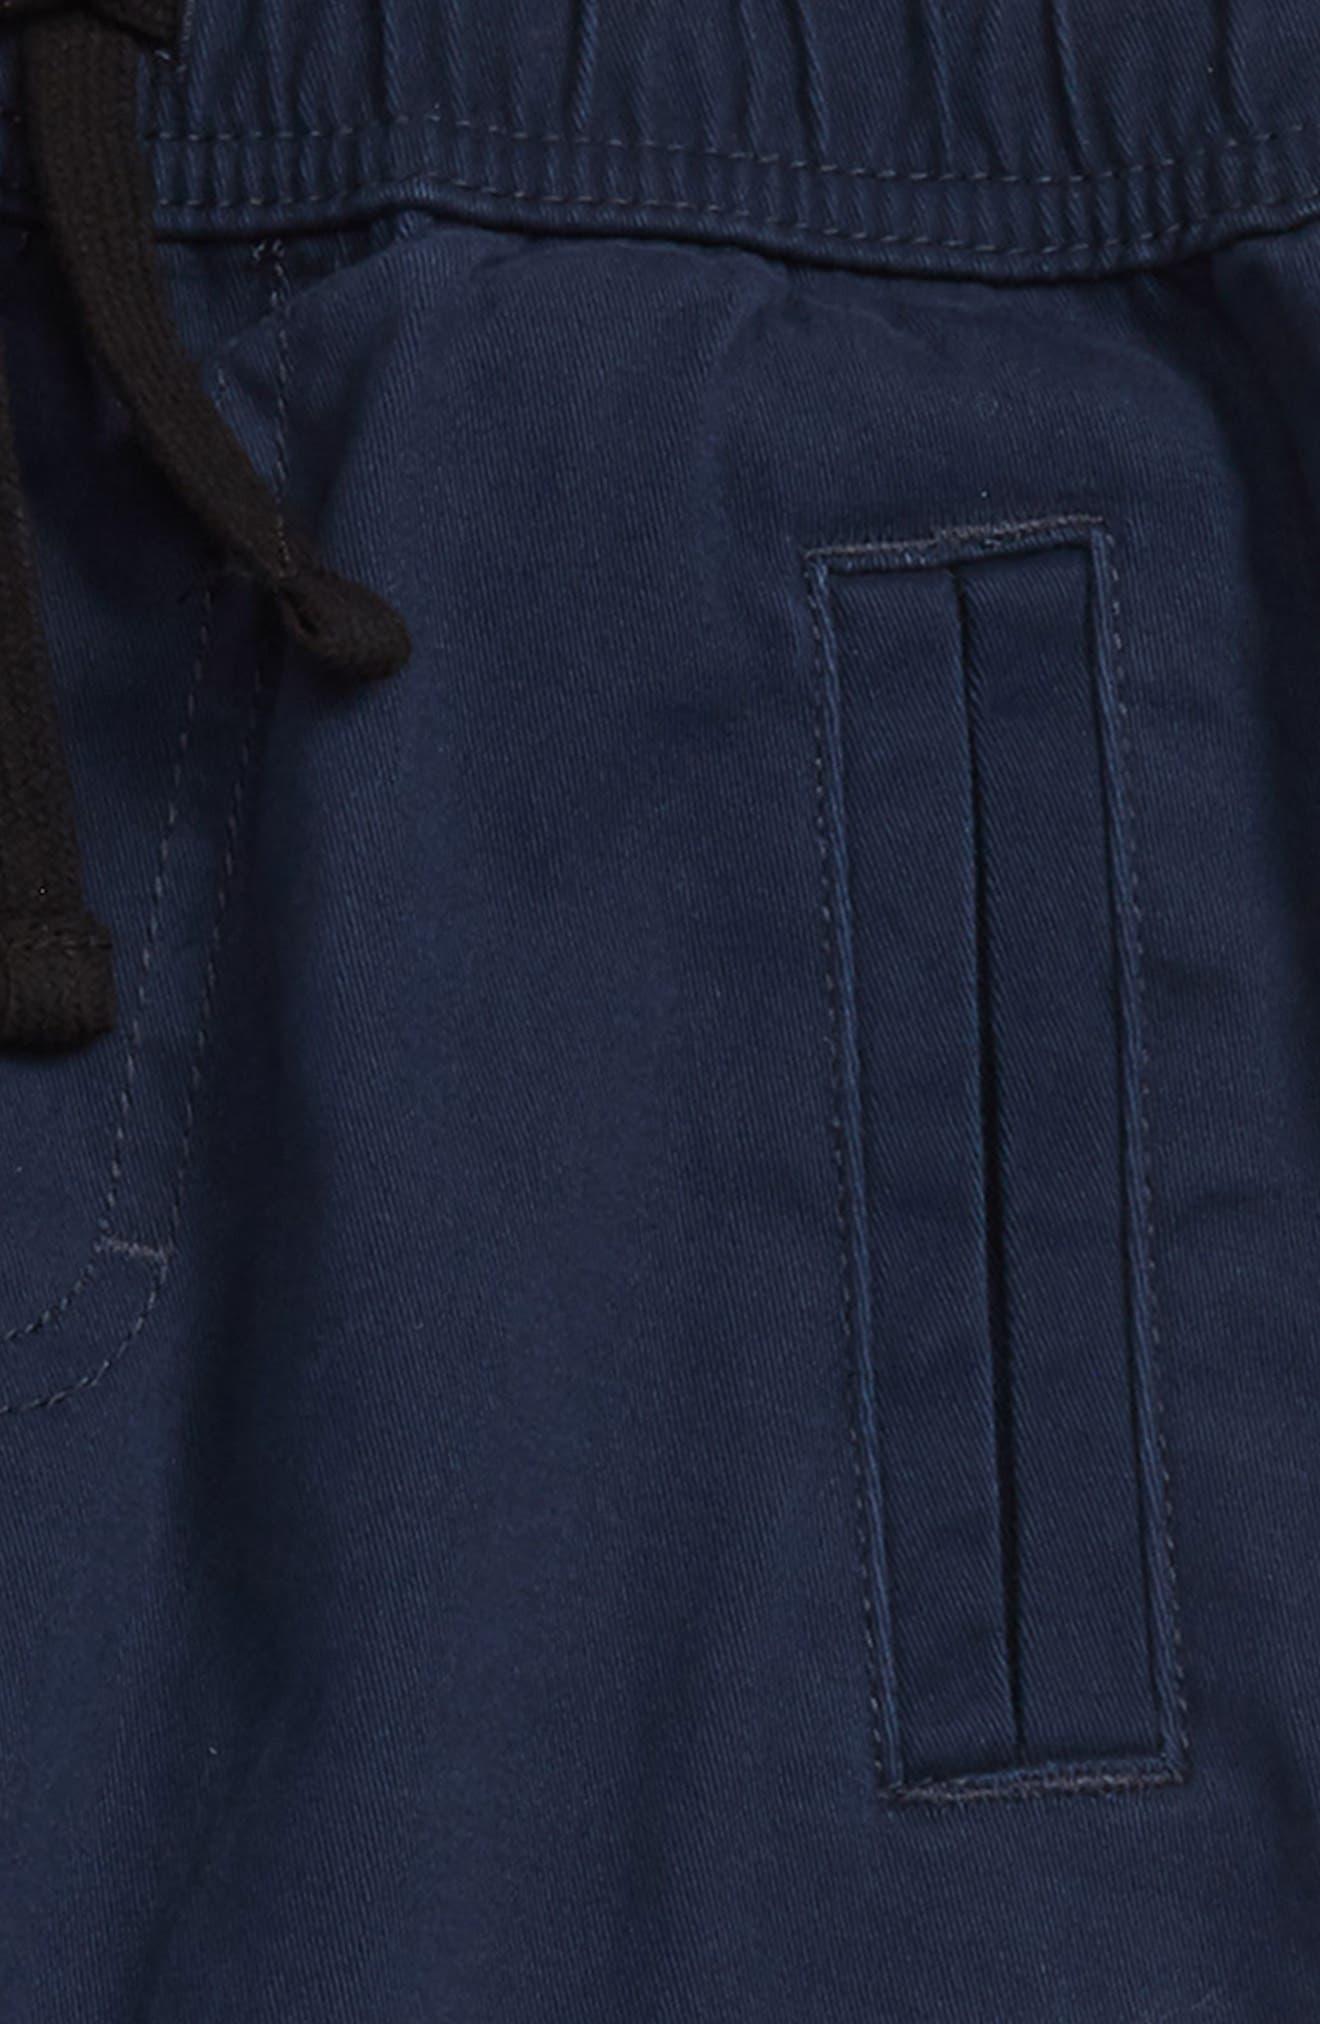 Woven Jogger Pants,                             Alternate thumbnail 2, color,                             Navy Blazer